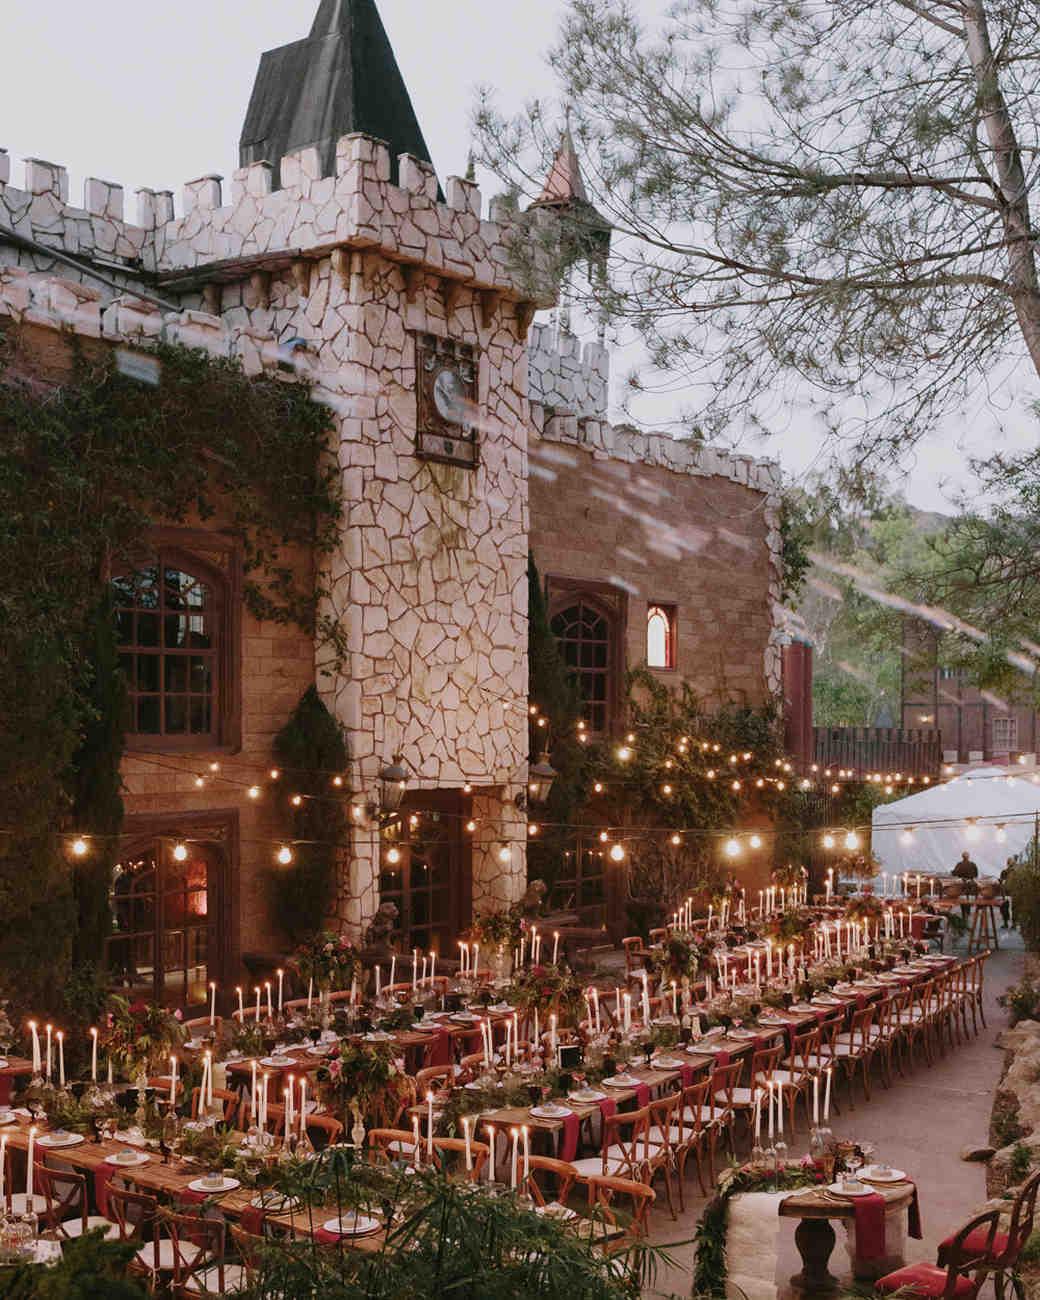 Hogwarts inspired wedding venue and decor